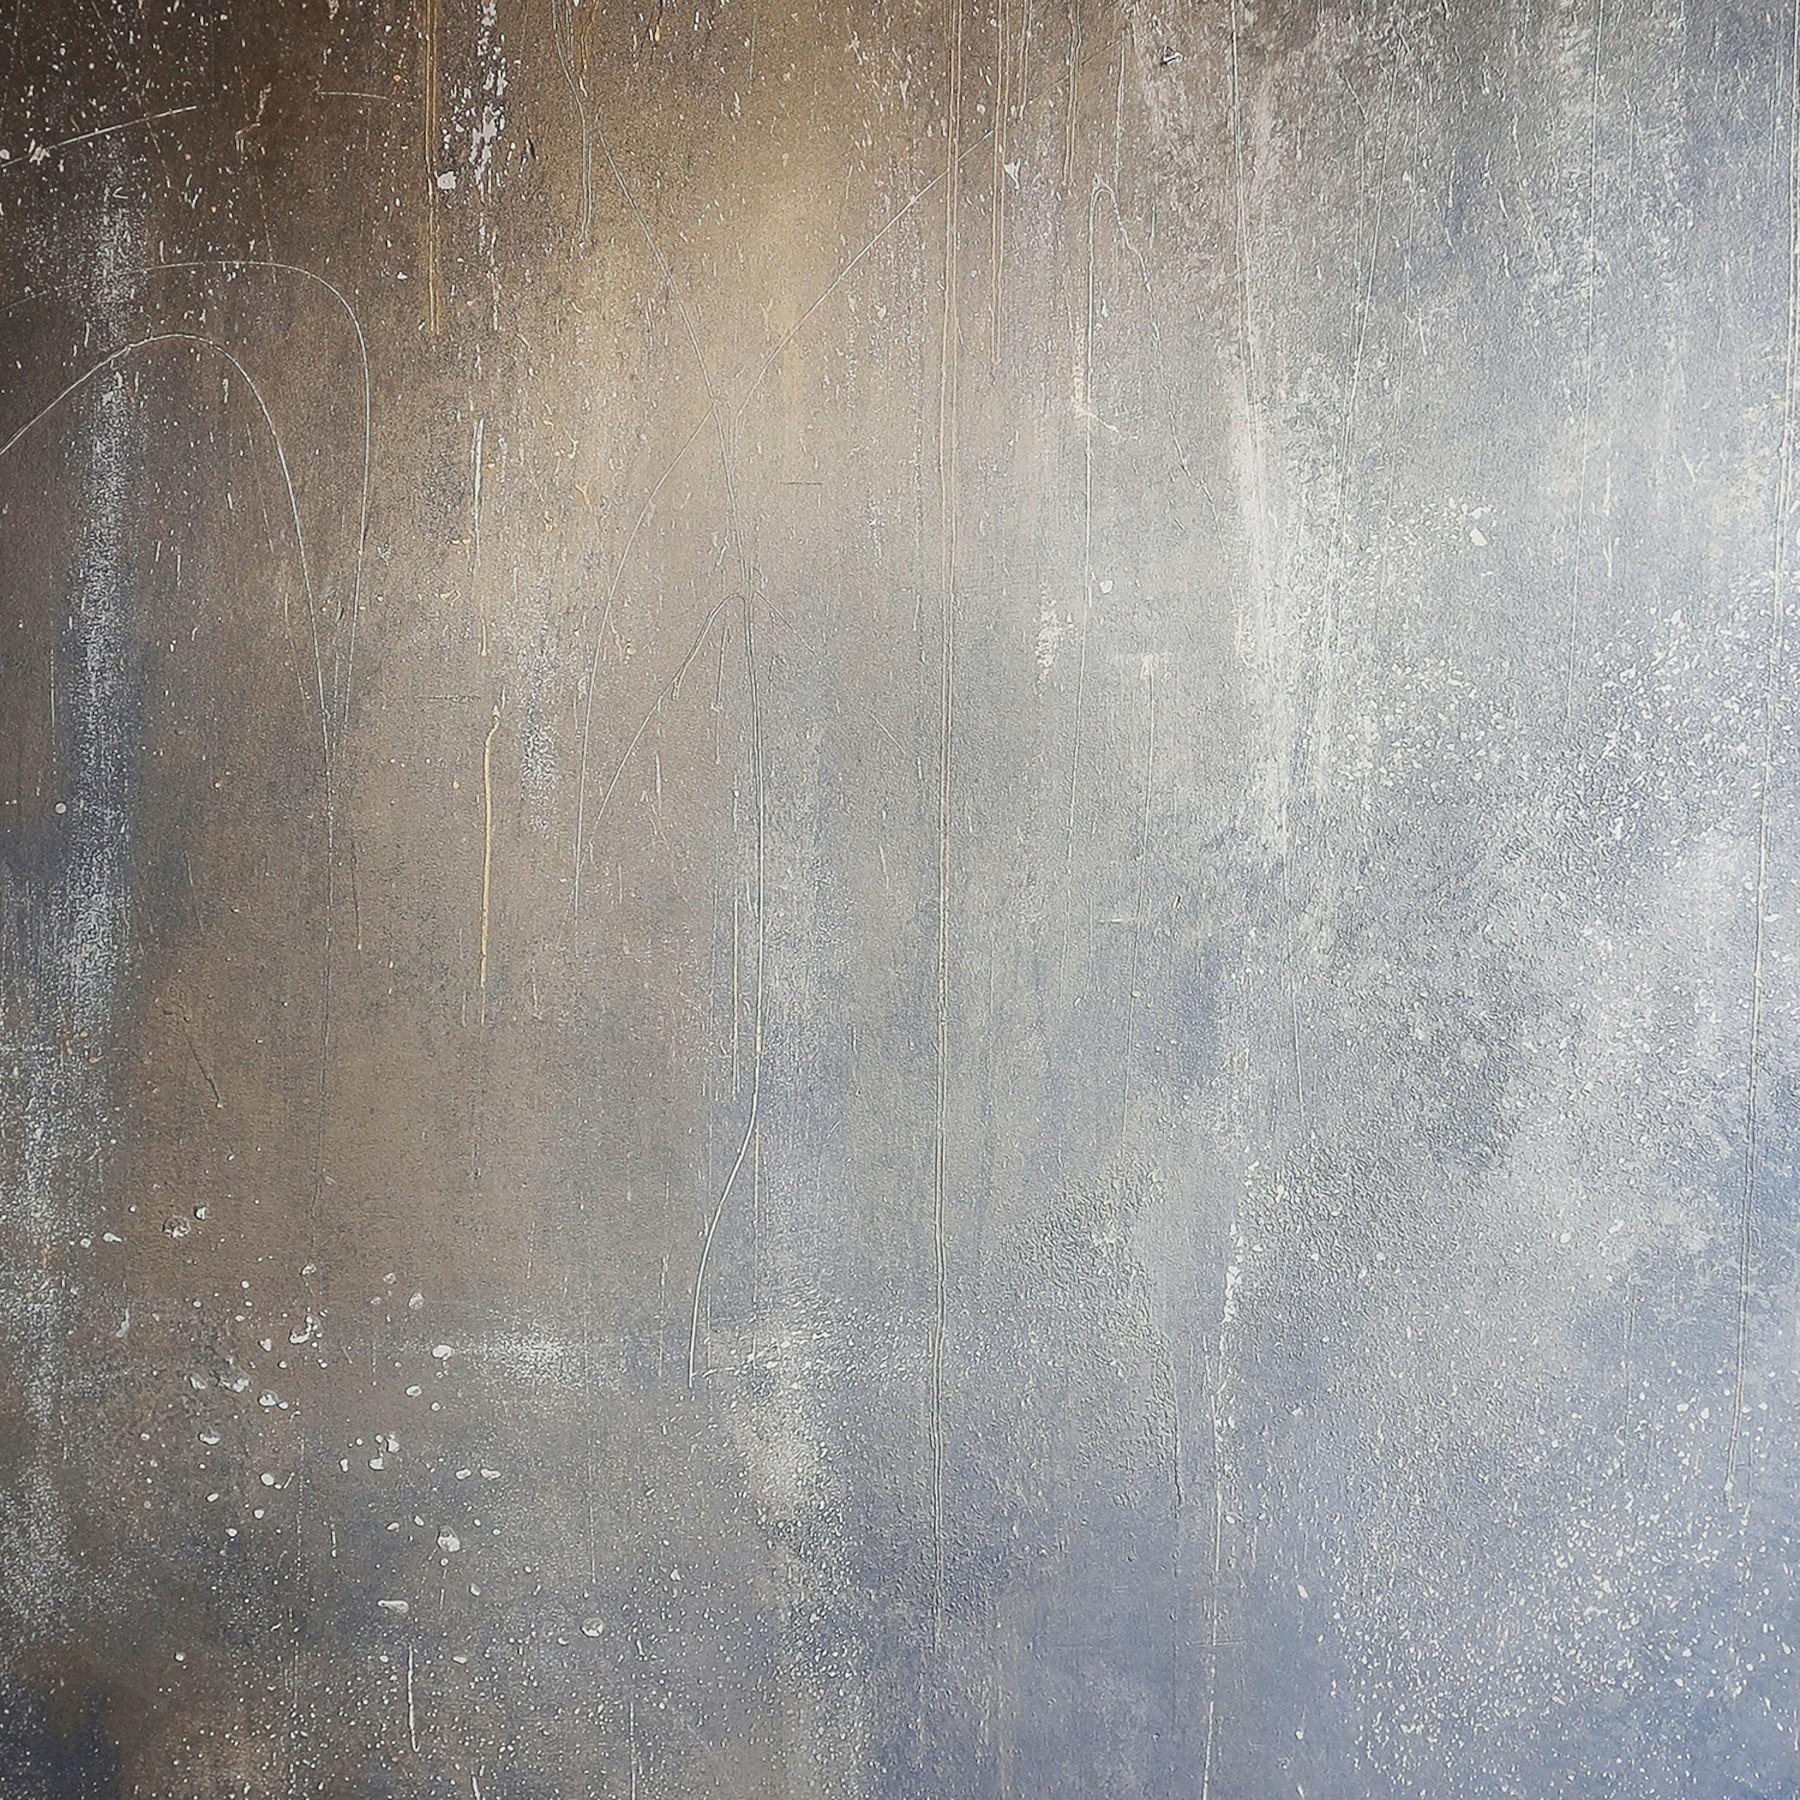 Lastolite Joe McNally Ironworks Collapsible – doppelseitiger, faltbarer Hintergrund 1,5 x 2,1m